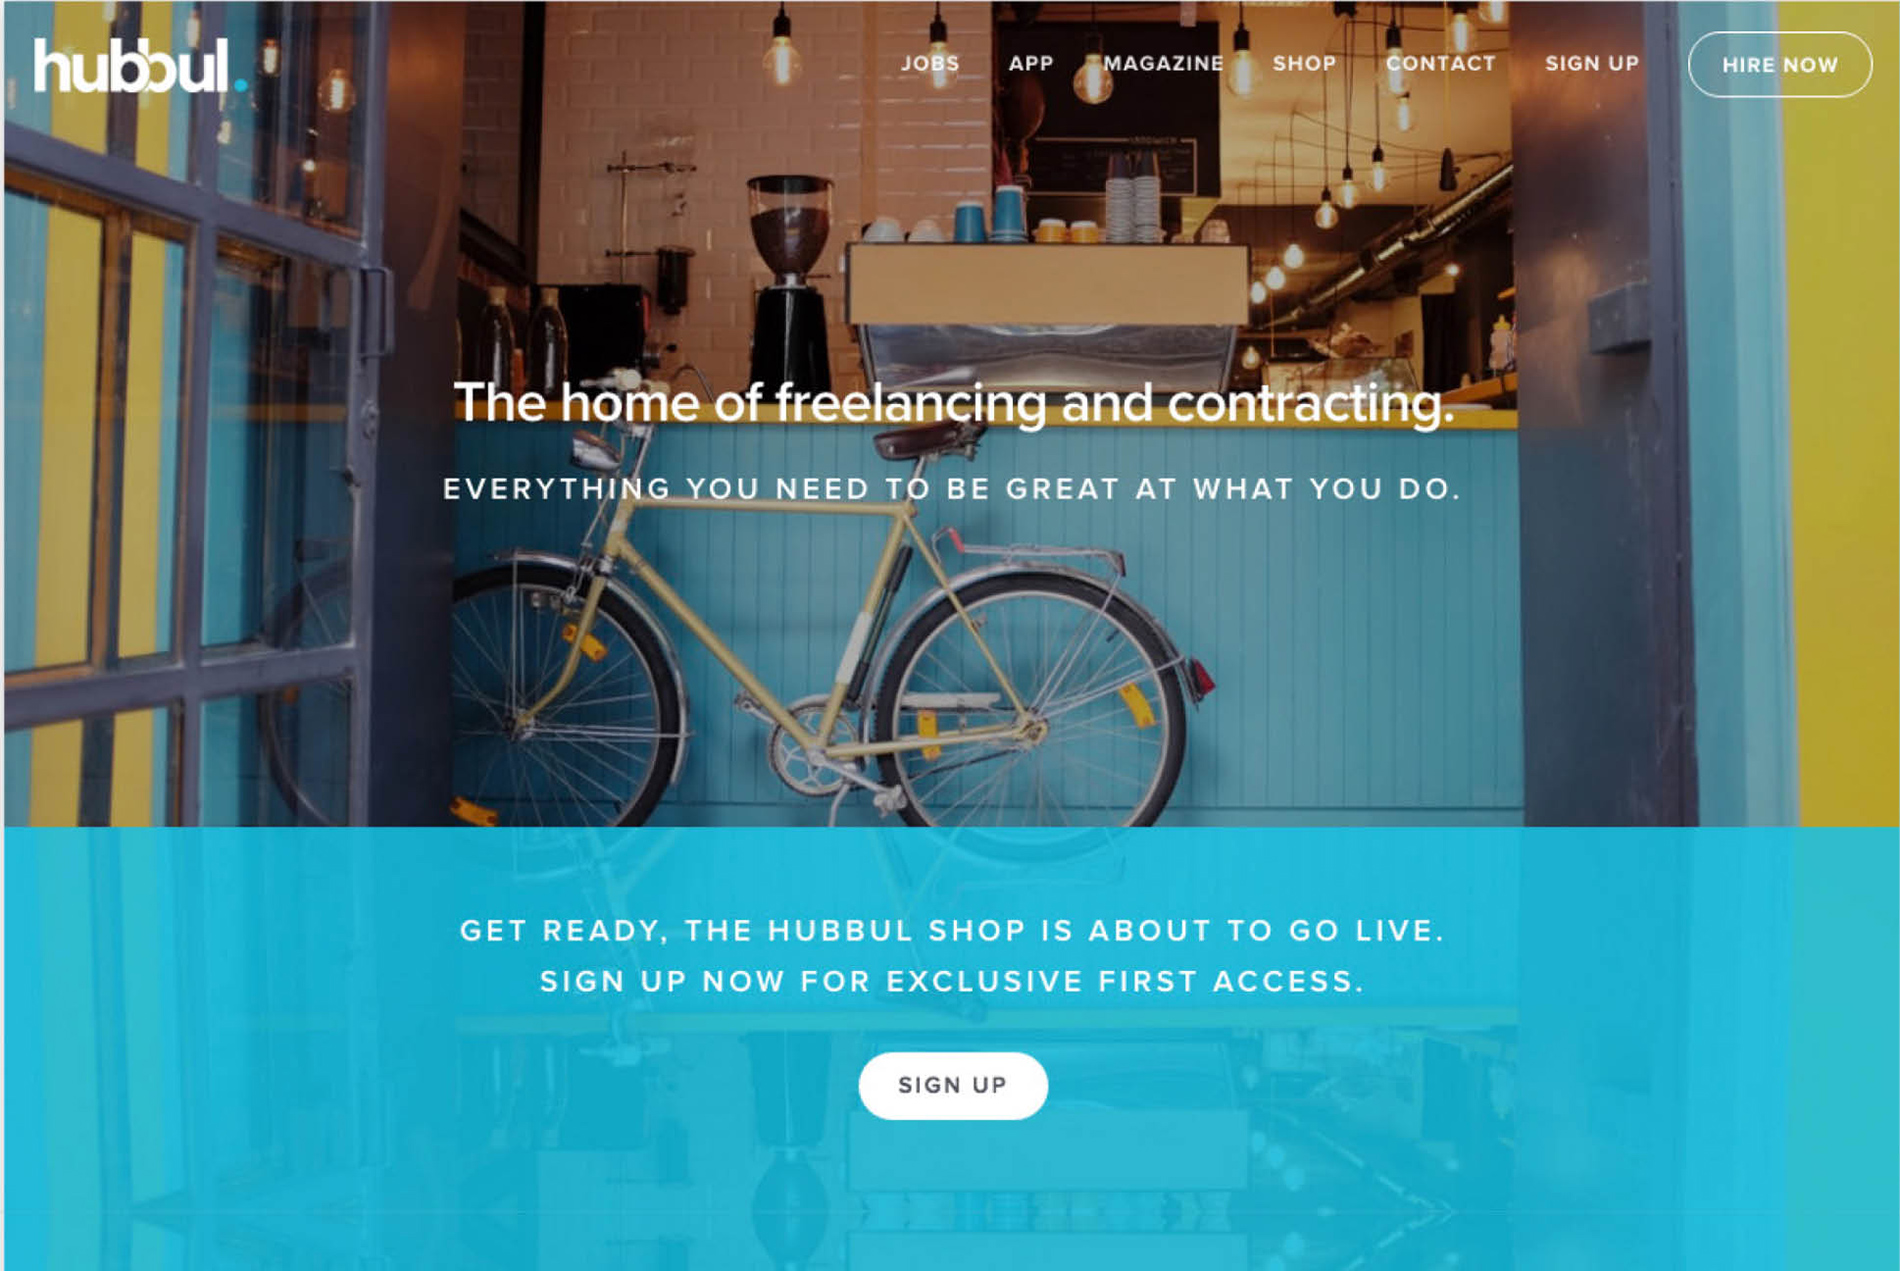 hubbul website